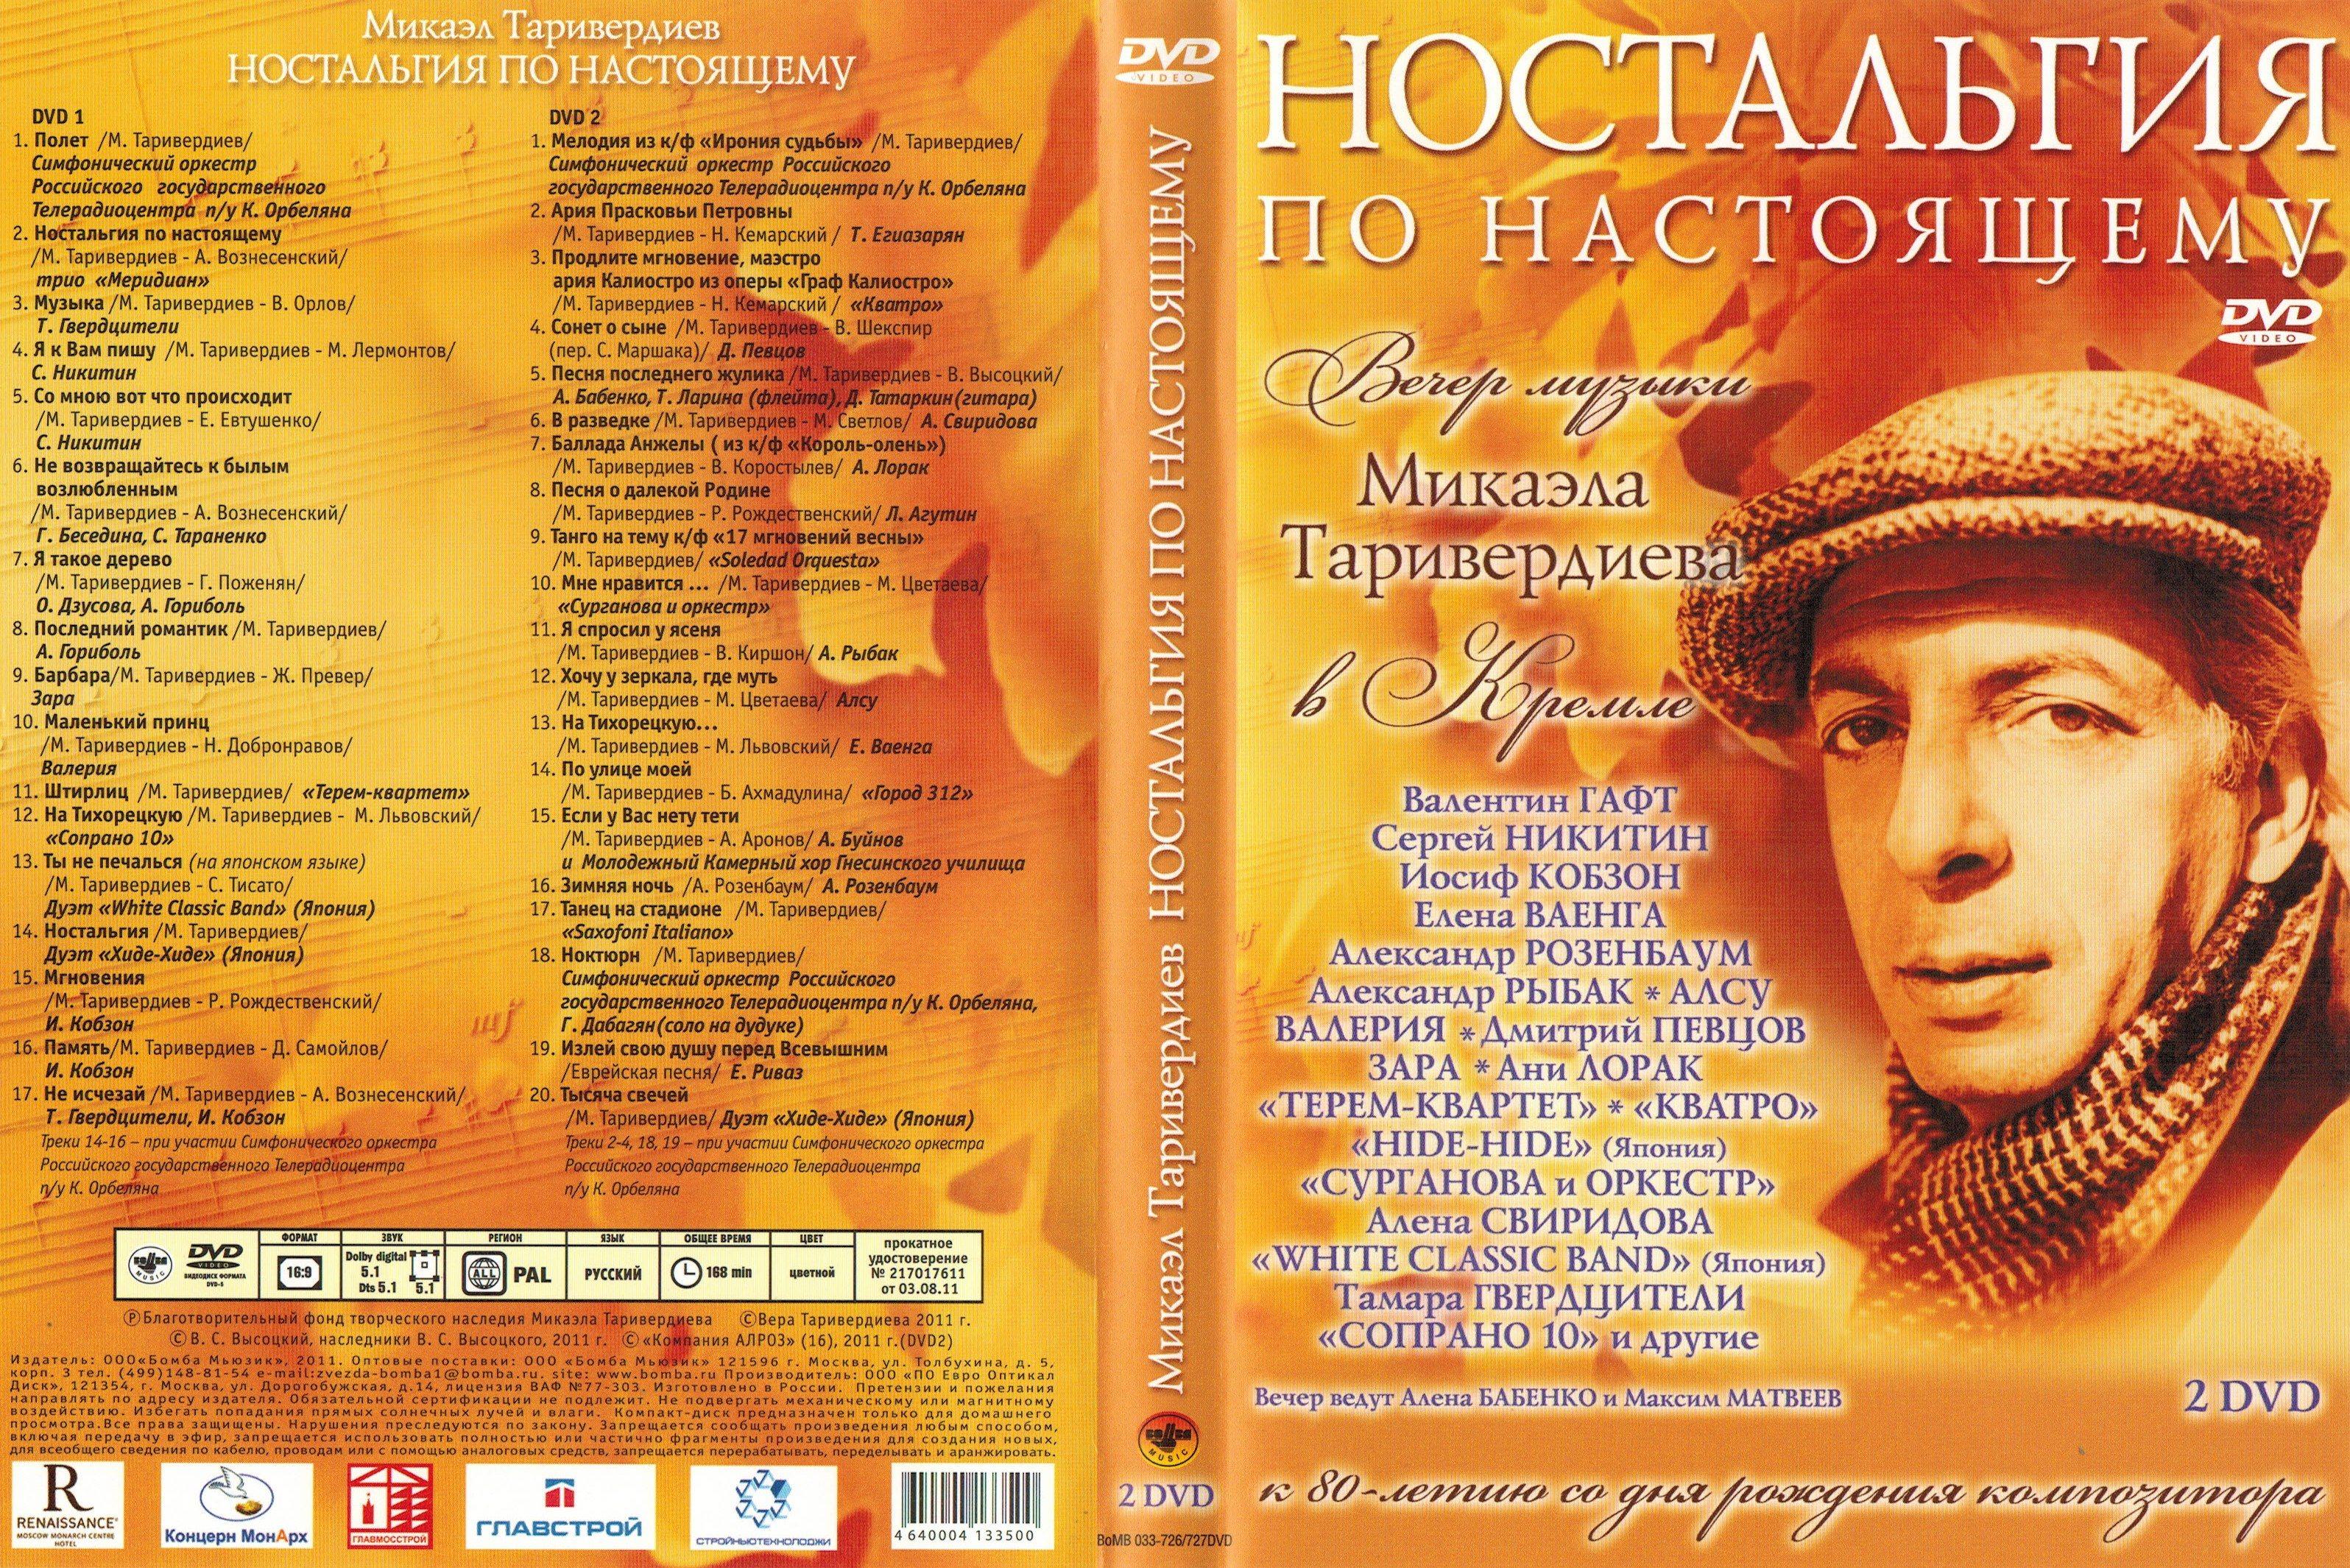 http://i1.imageban.ru/out/2014/07/30/ea7a22f447fe06461d513484218027ae.jpg